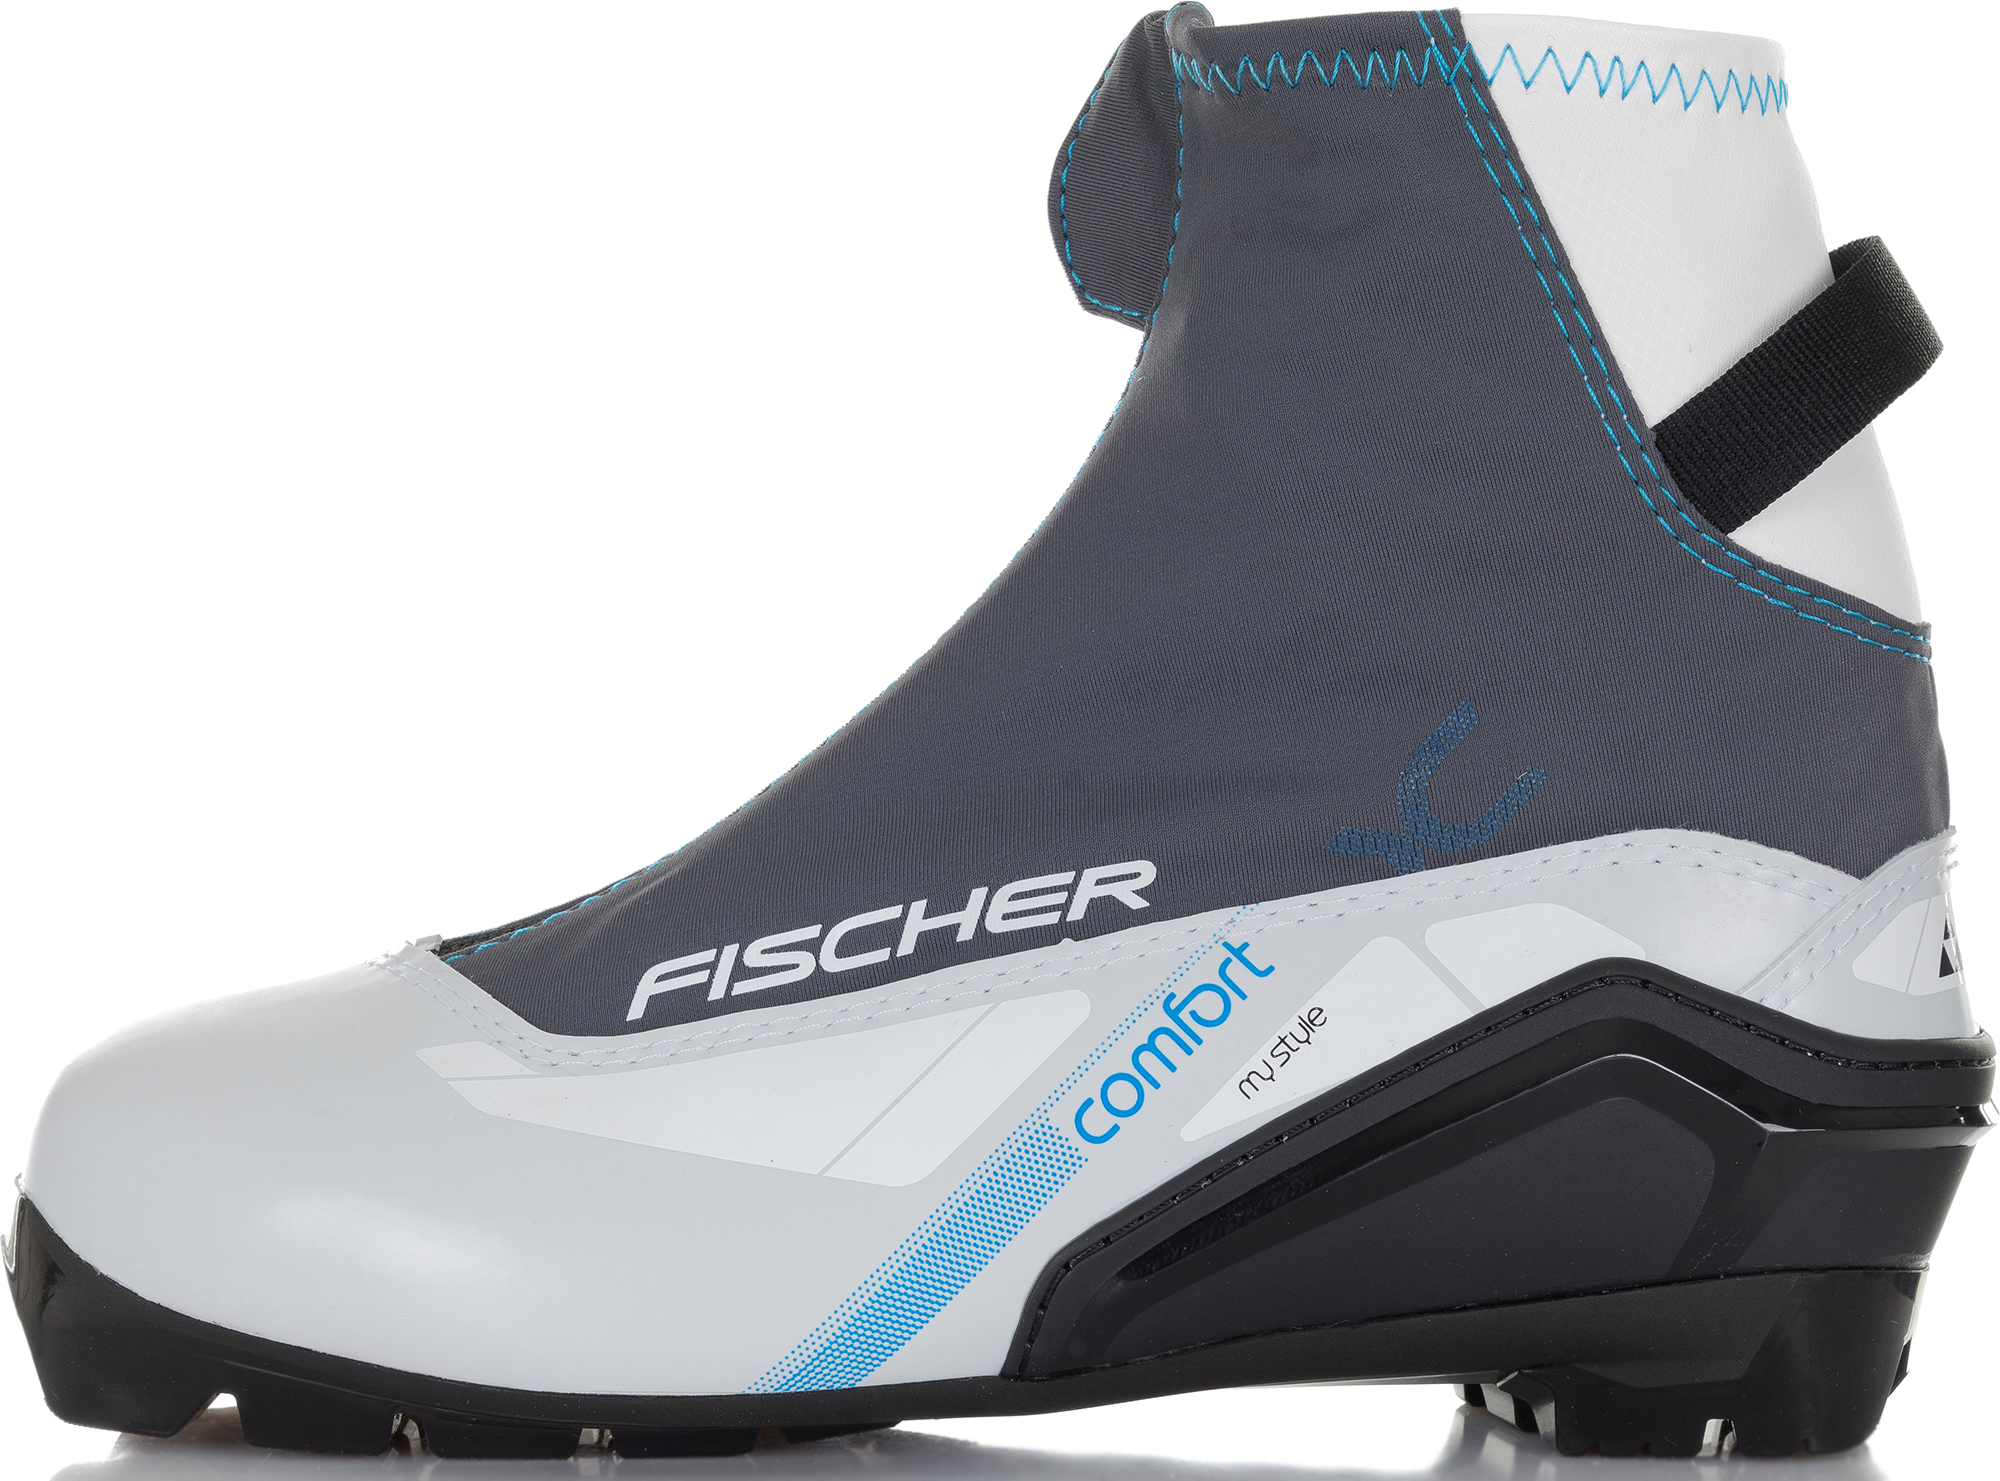 Fischer Ботинки для беговых лыж женские Fischer Xc Comfort My Style SM, размер 36 цена